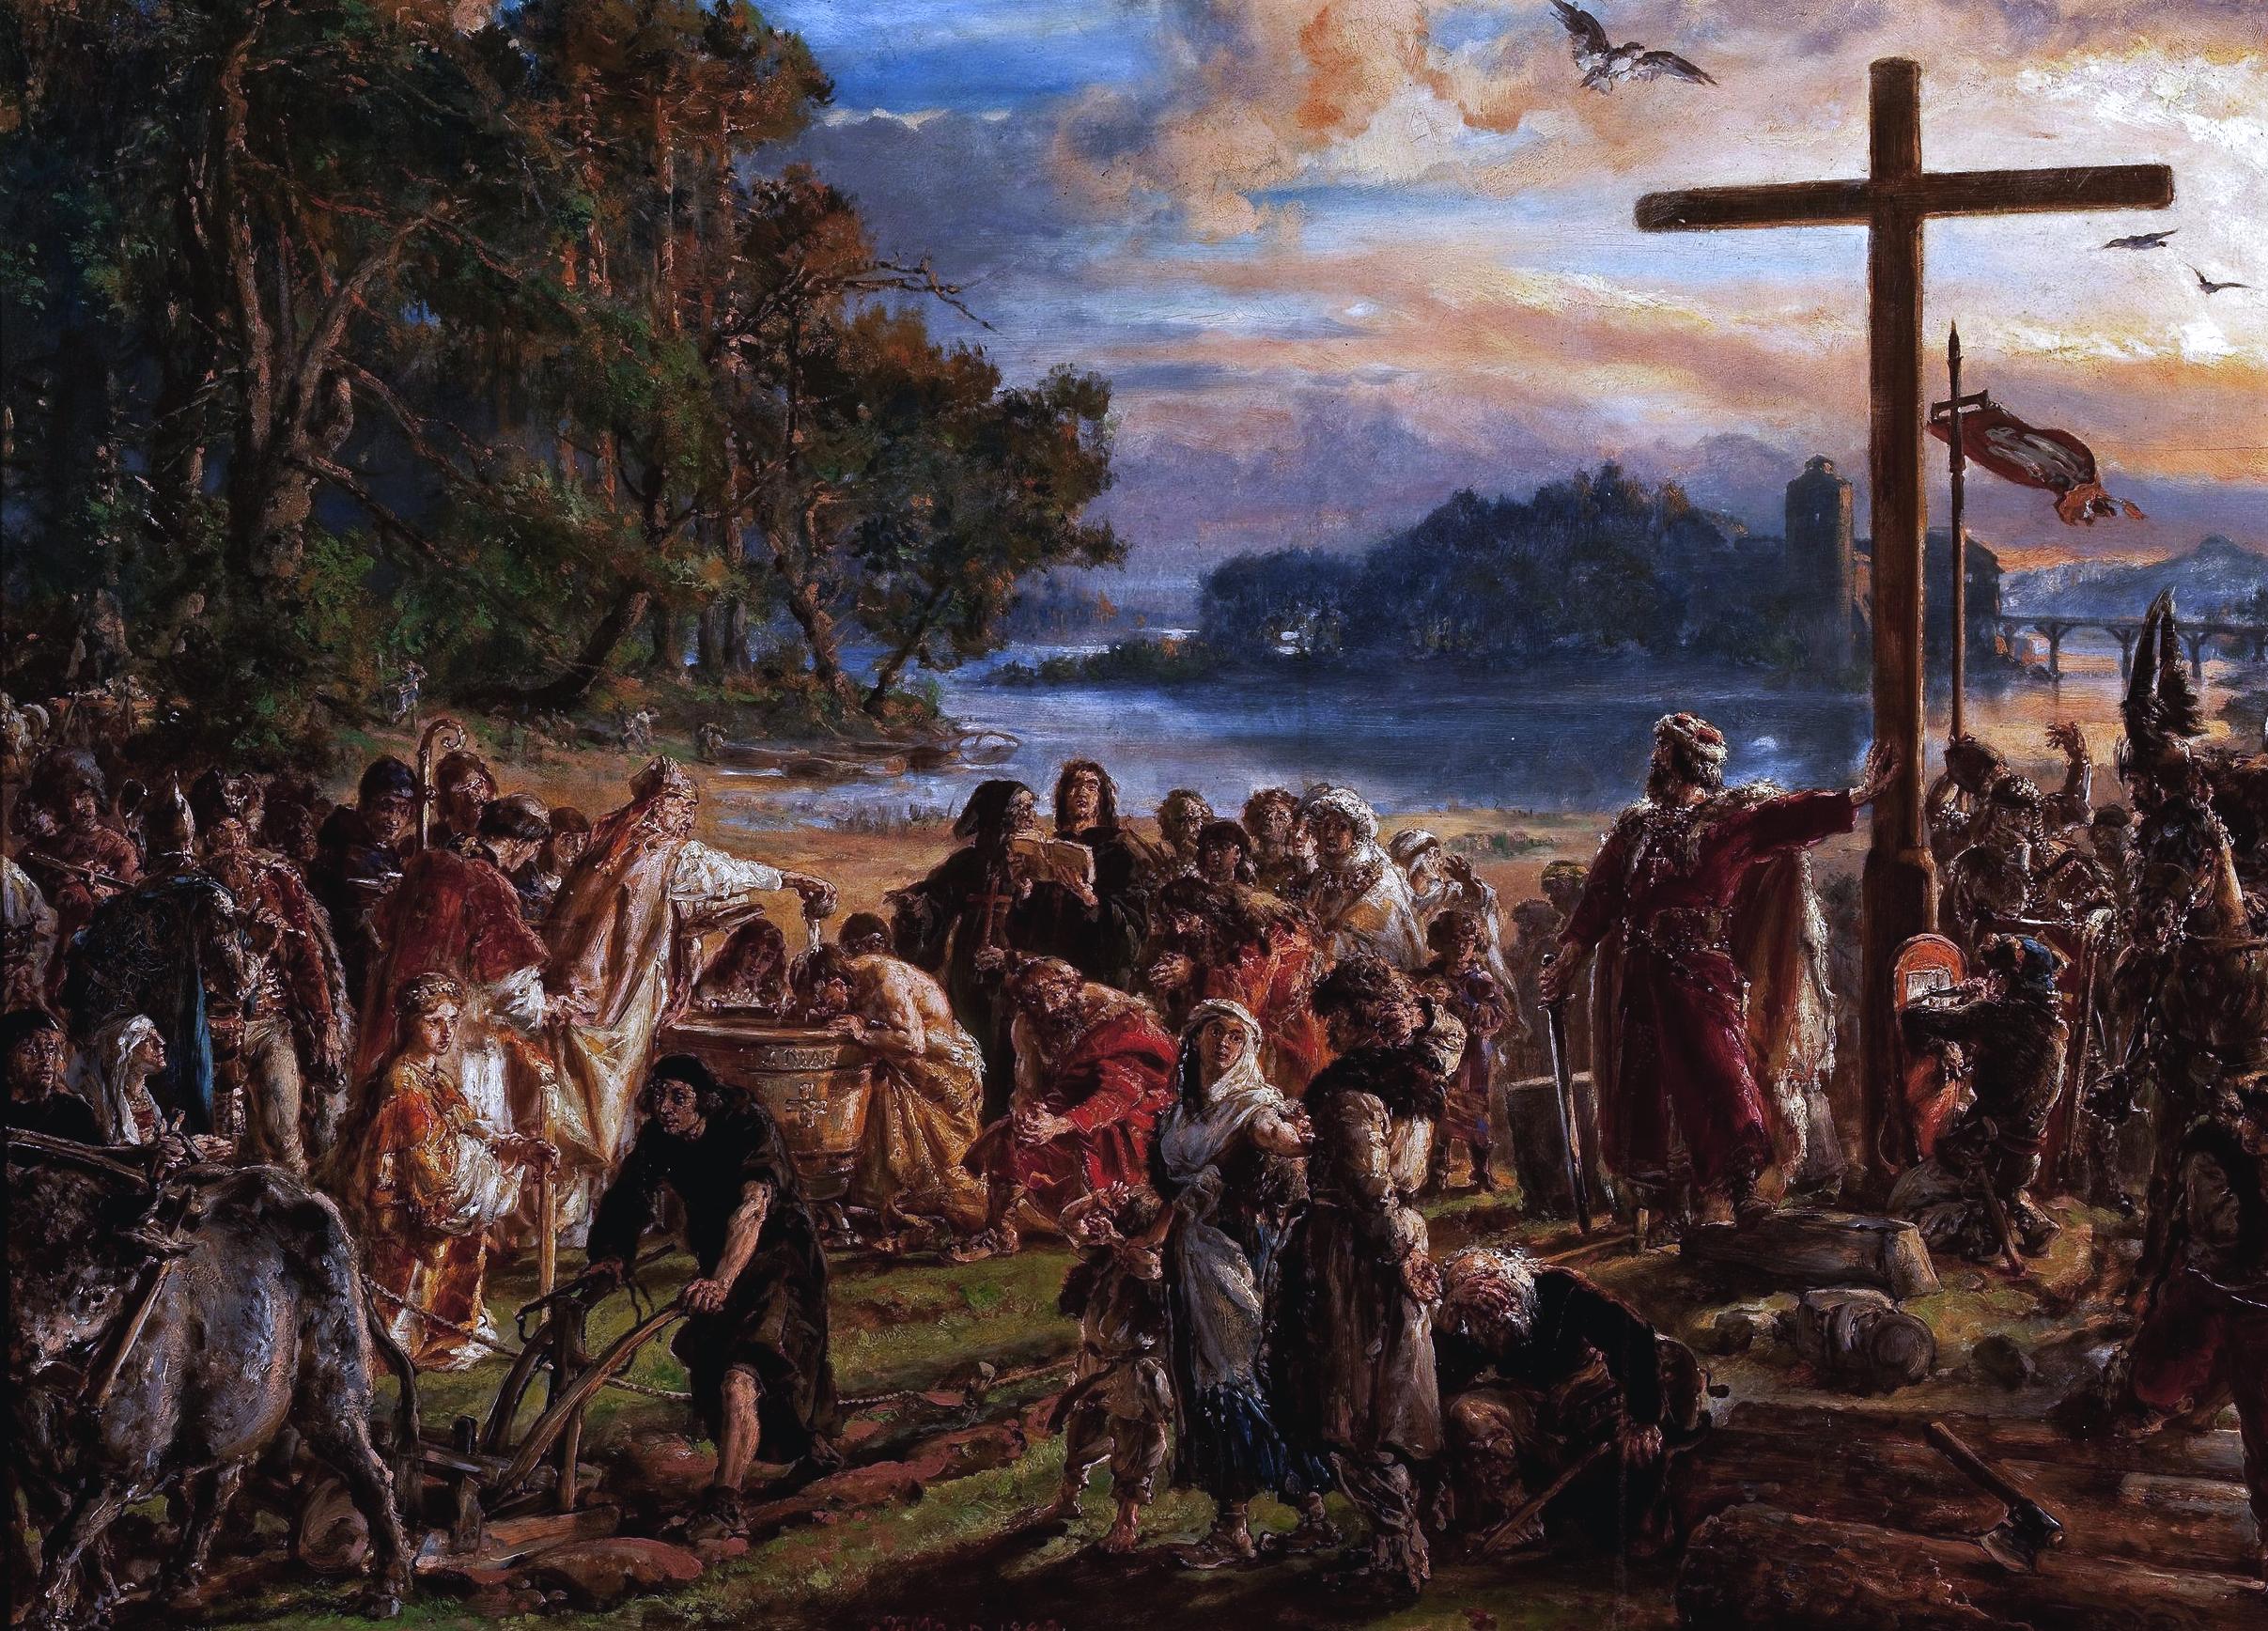 https://upload.wikimedia.org/wikipedia/commons/1/19/Christianization_A.D._965_by_Jan_Matejko_%281889%29.png